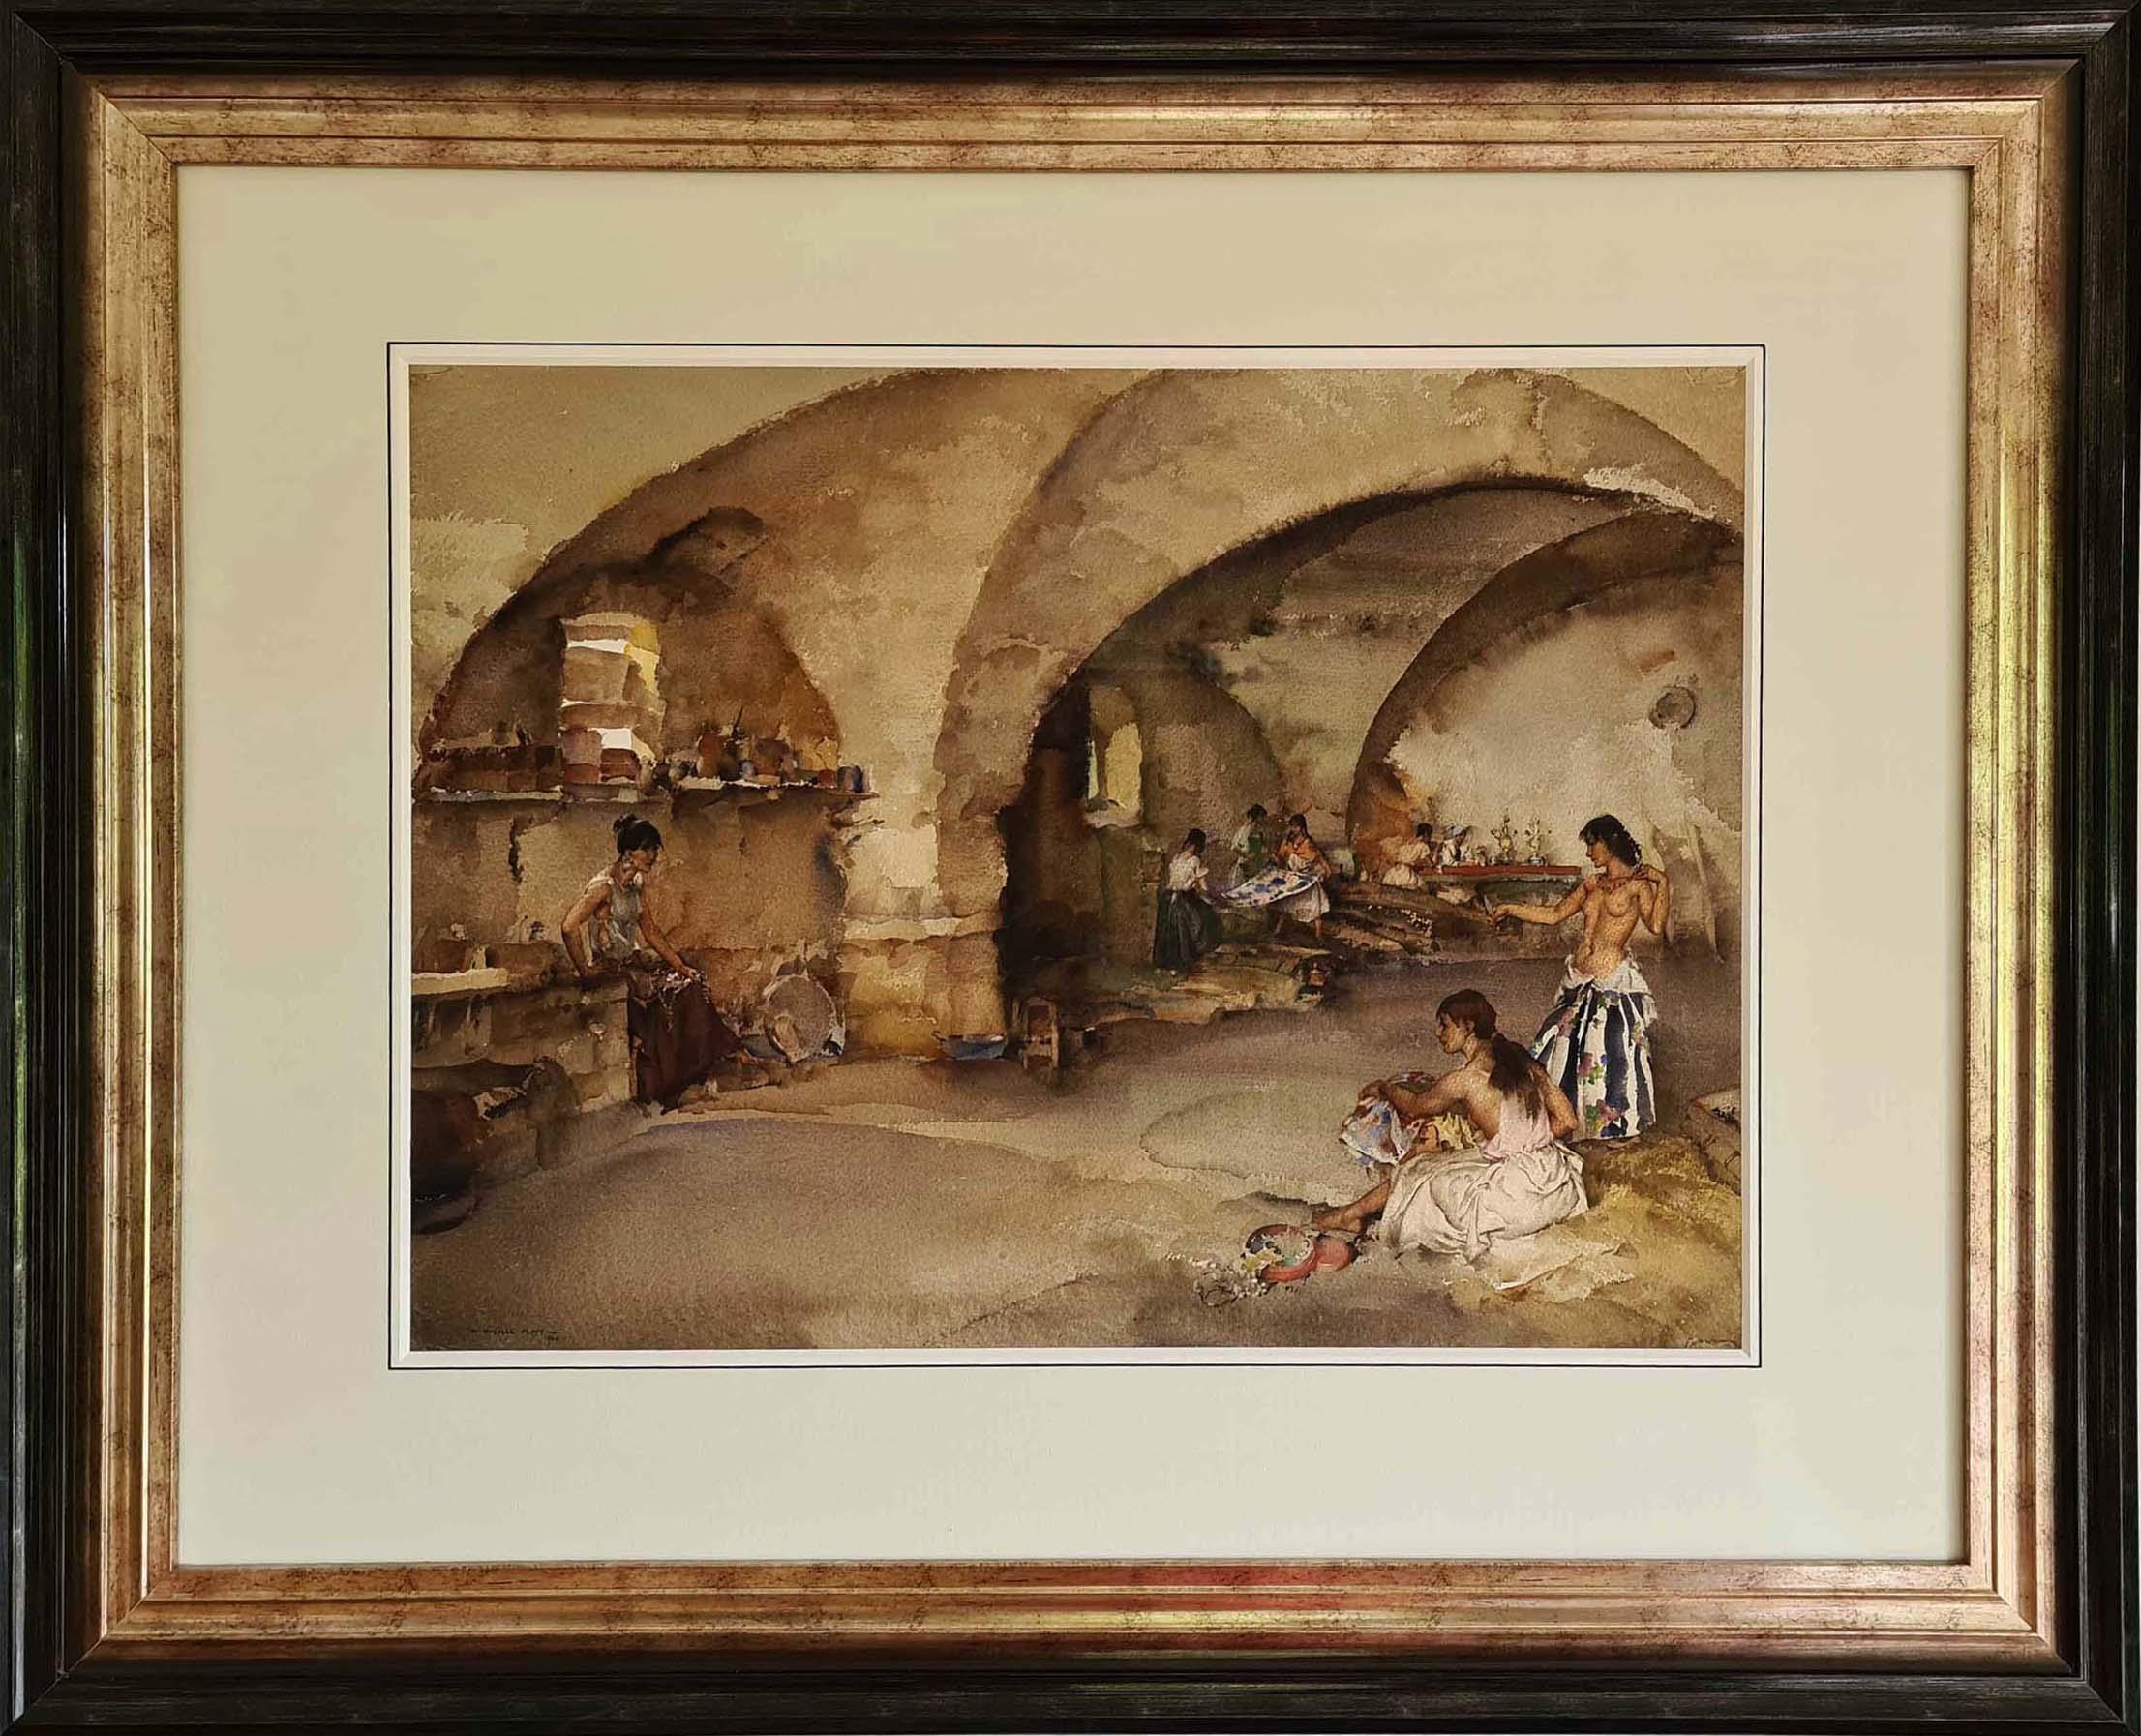 sir william russell flint paintings, la cave